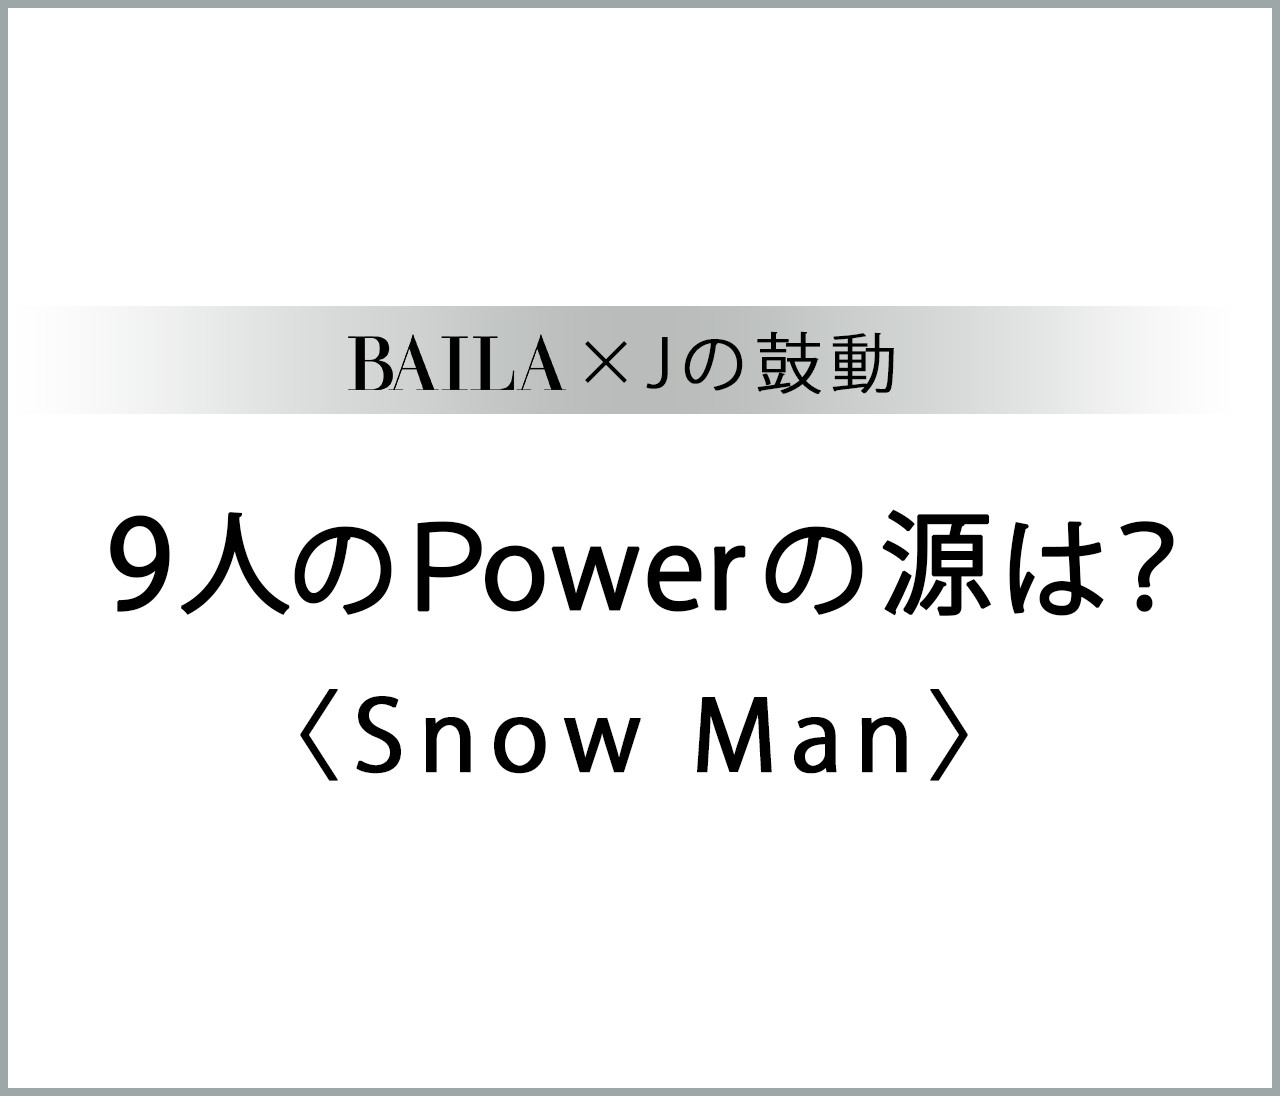 【 #SnowMan 】Snow Manメンバー9人のパワーの源は?【BAILA × Jの鼓動】